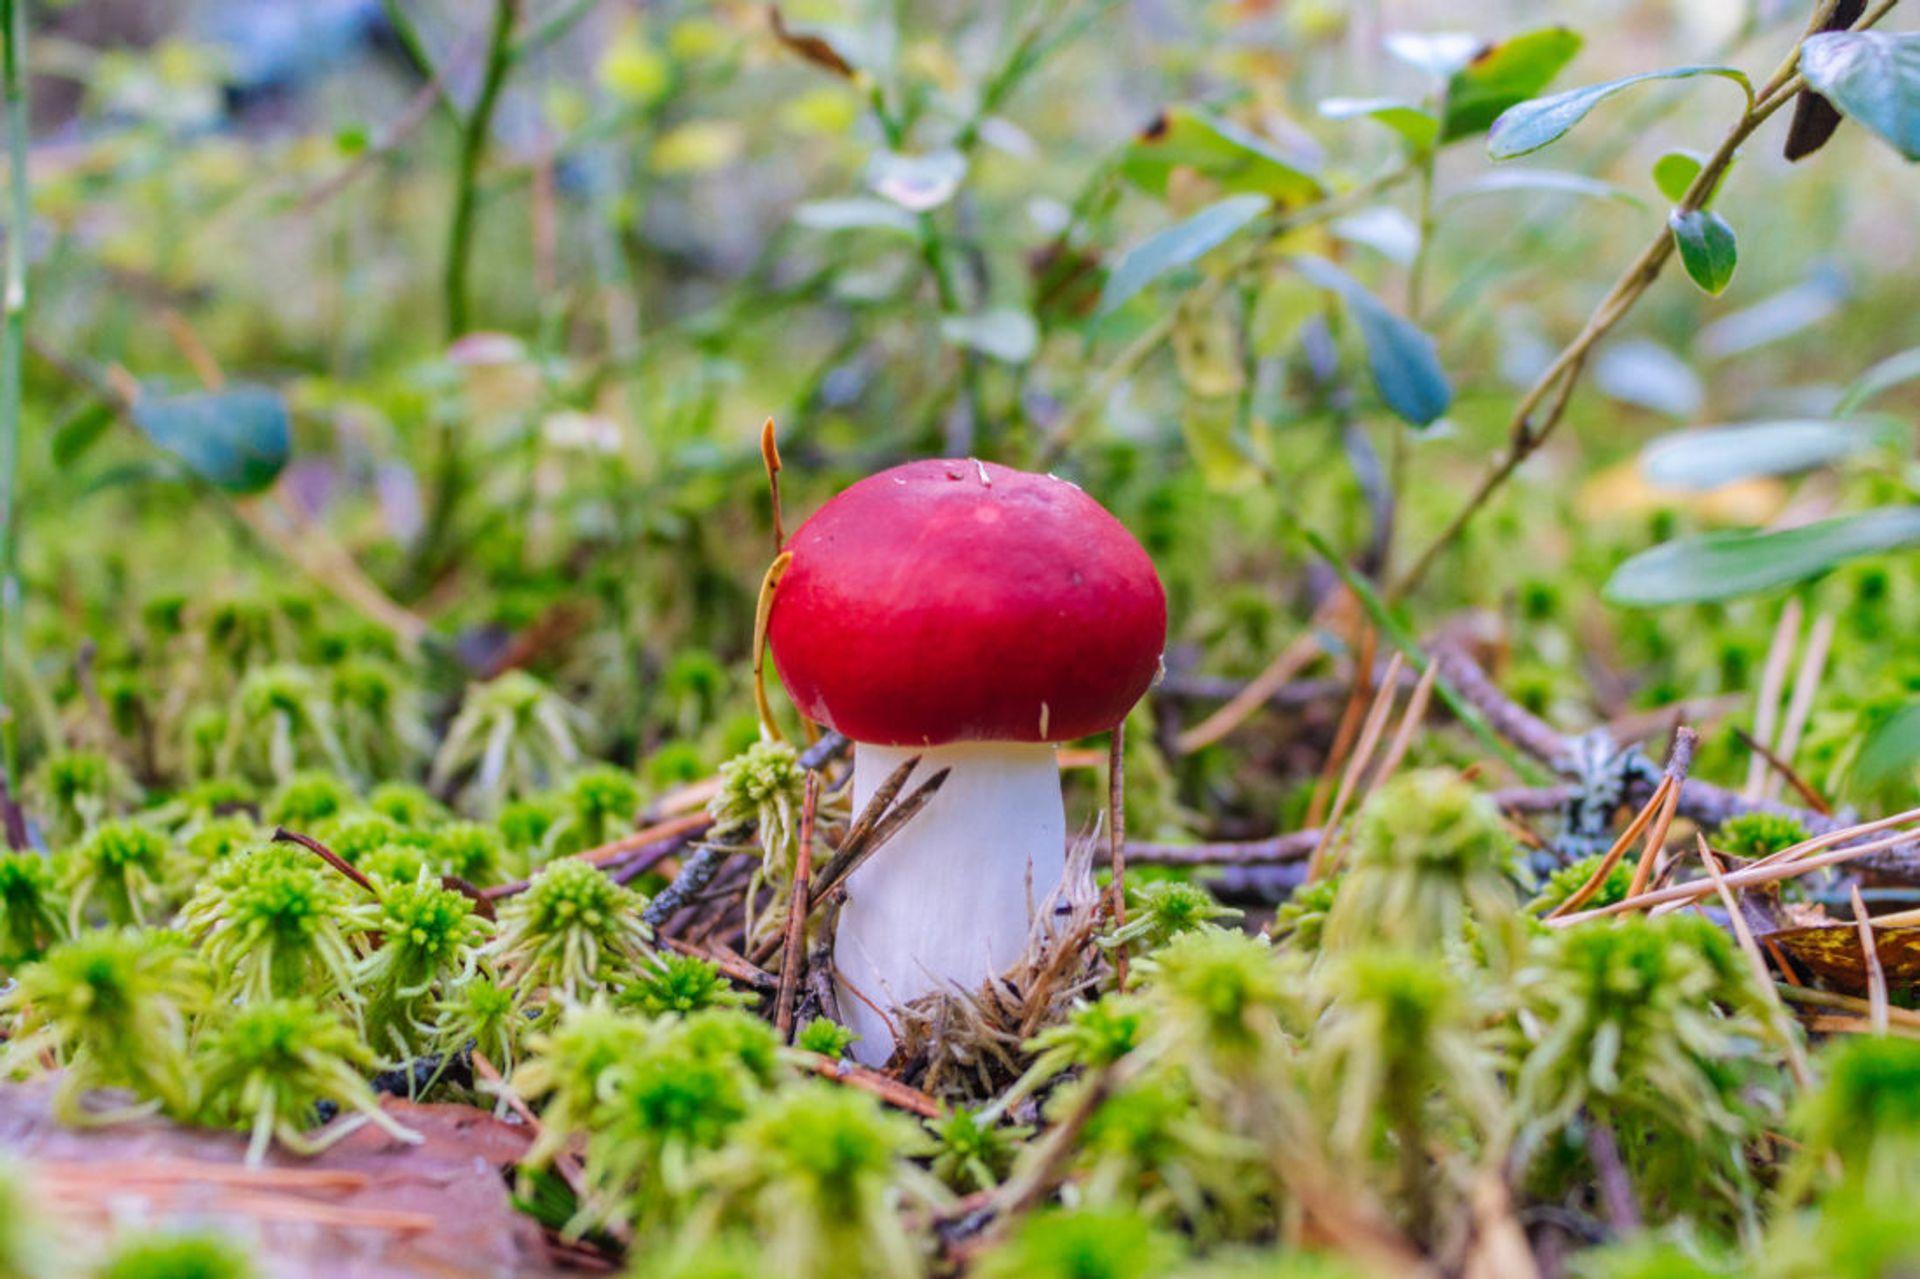 Close up of a red mushroom.